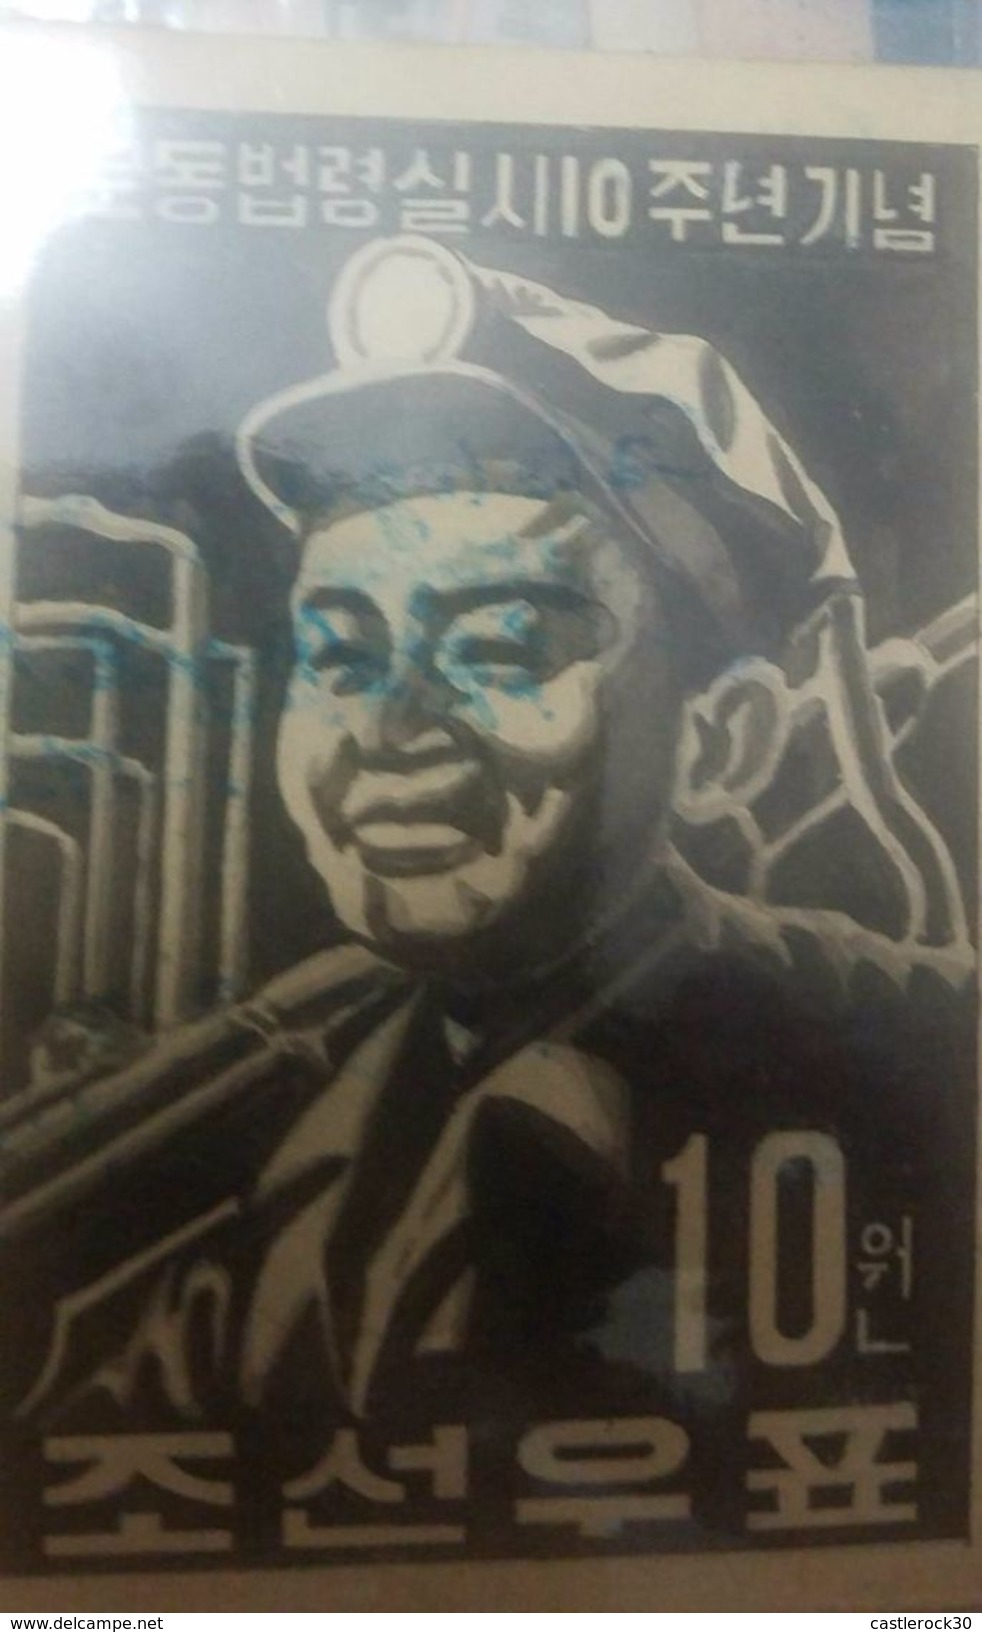 O) 1956 KOREA, ORIGINAL ARTWORK DESIGN, LABOR LAW 10TH ANNIVERSARY, SCOTT A 74, XF - Korea (...-1945)